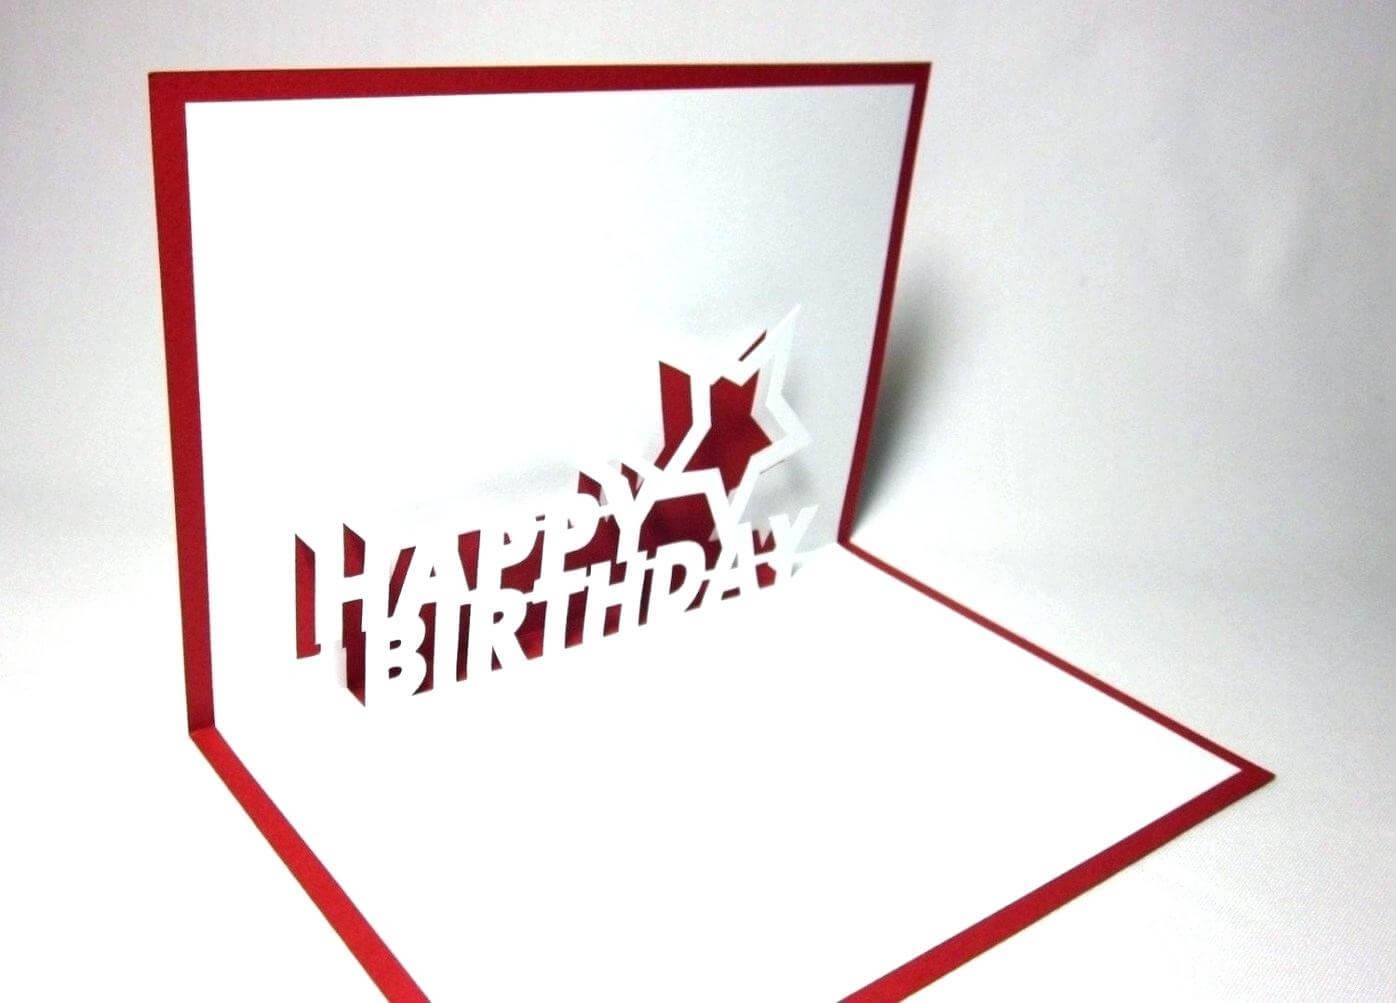 031 Pop Up Birthday Card Template Ideas Inspirational Free with Pop Up Card Templates Free Printable